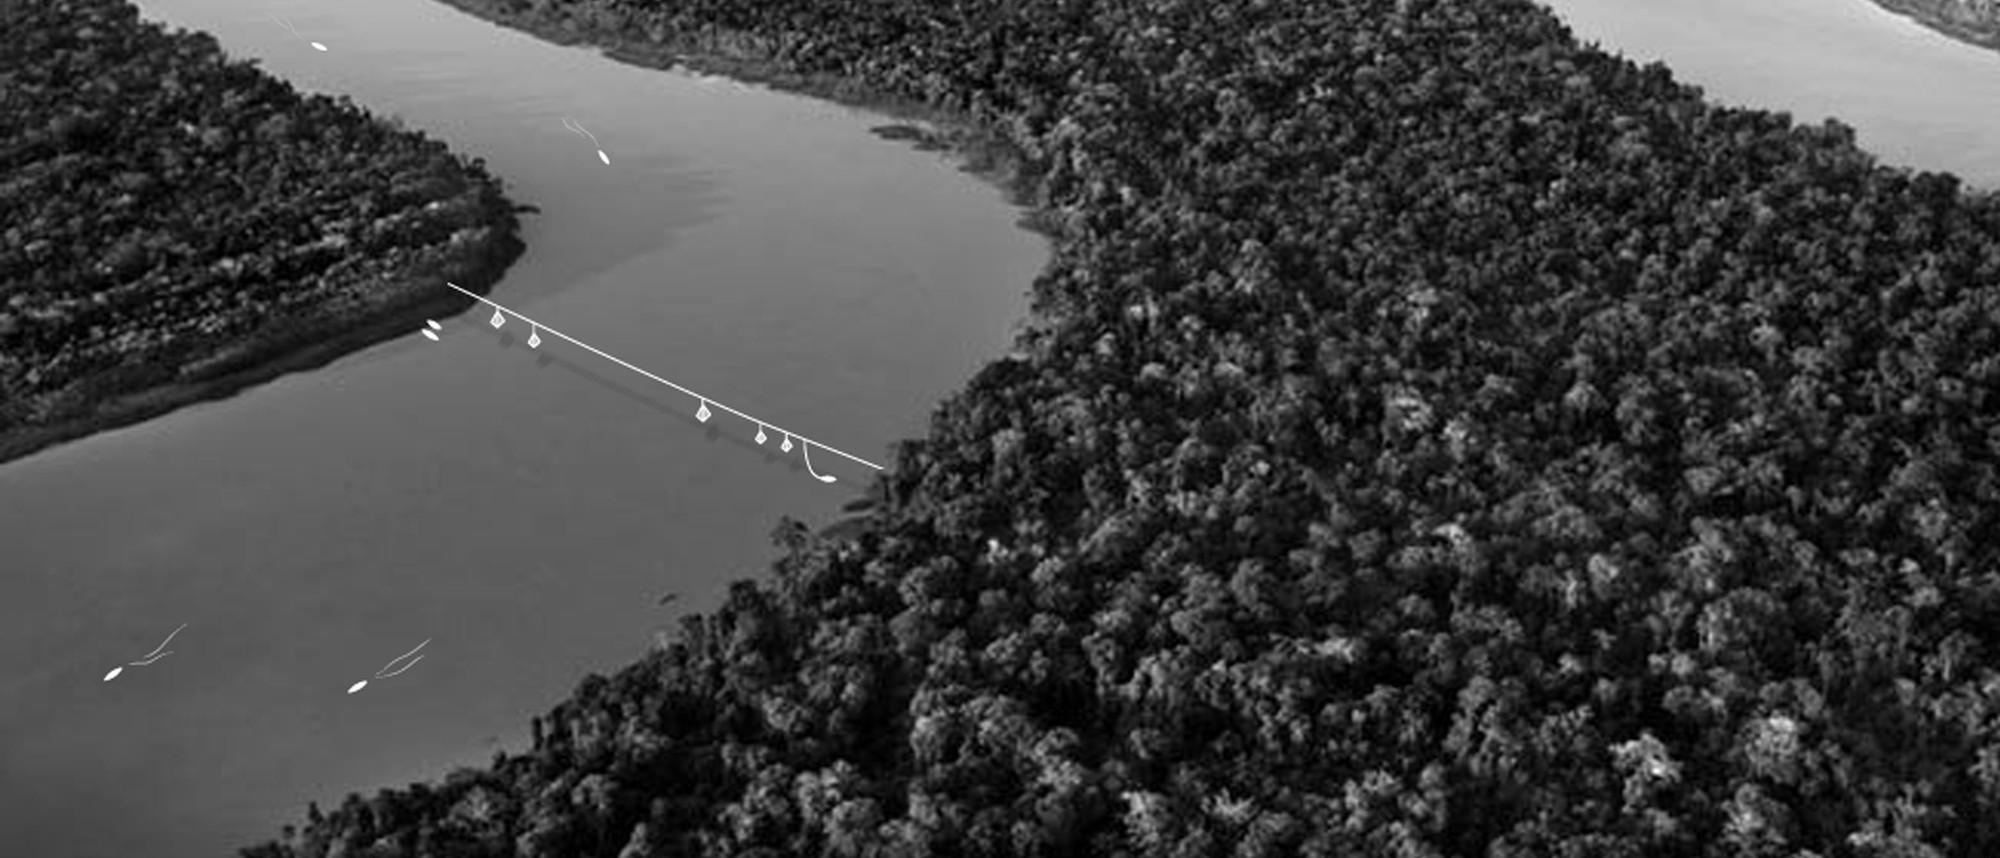 Meandro. Image Cortesia de Equipo Primer Lugar